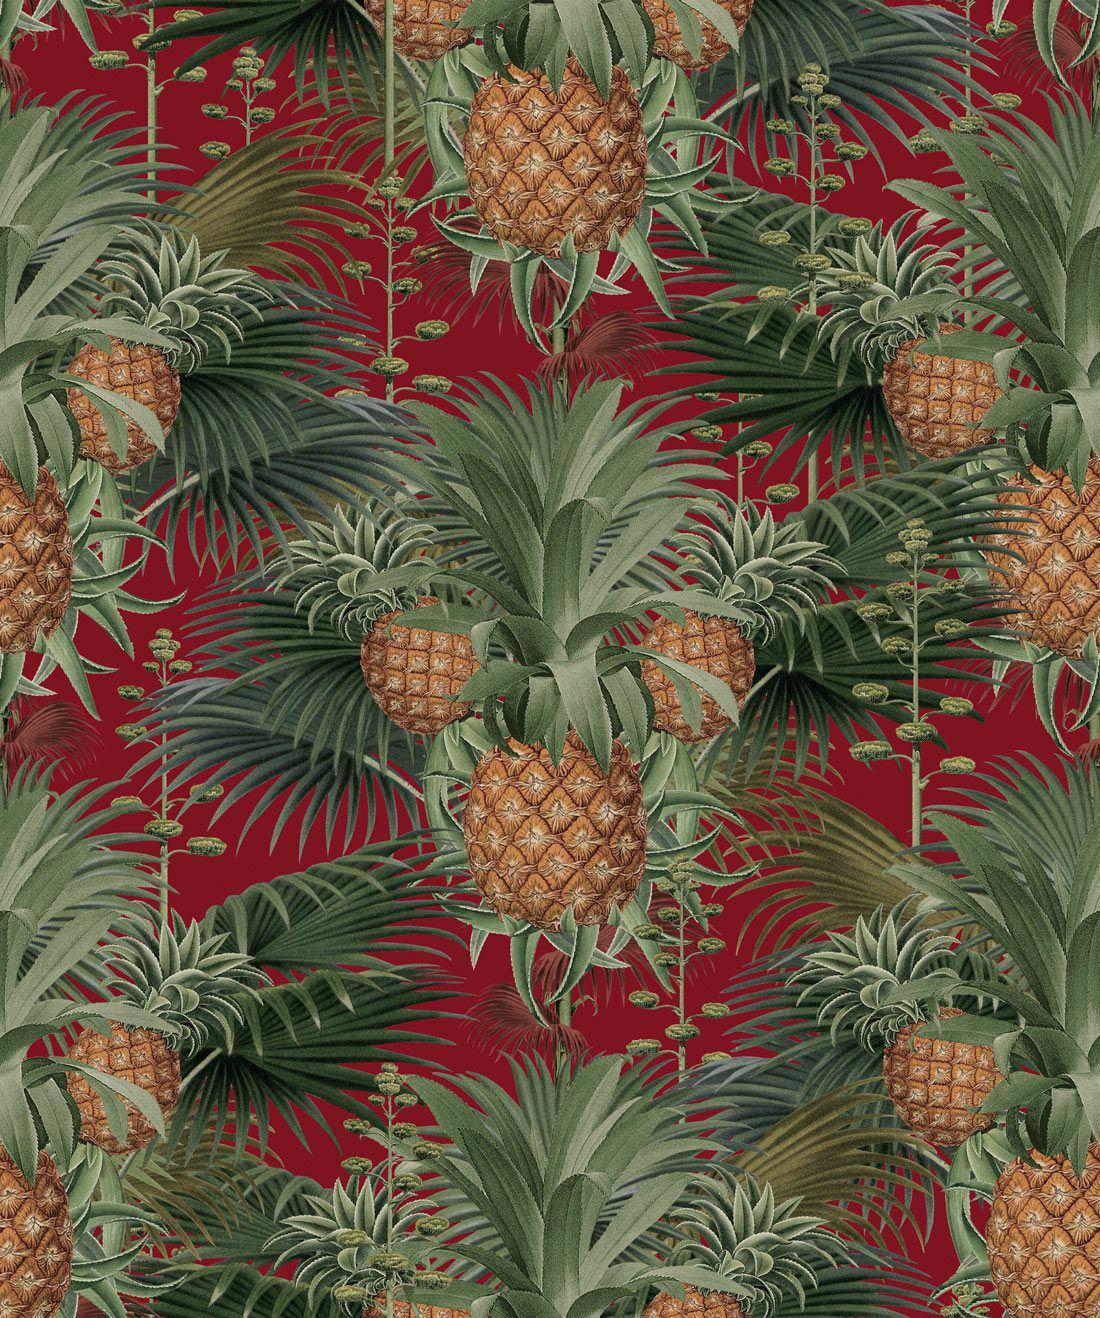 Pineapple Harvest Red